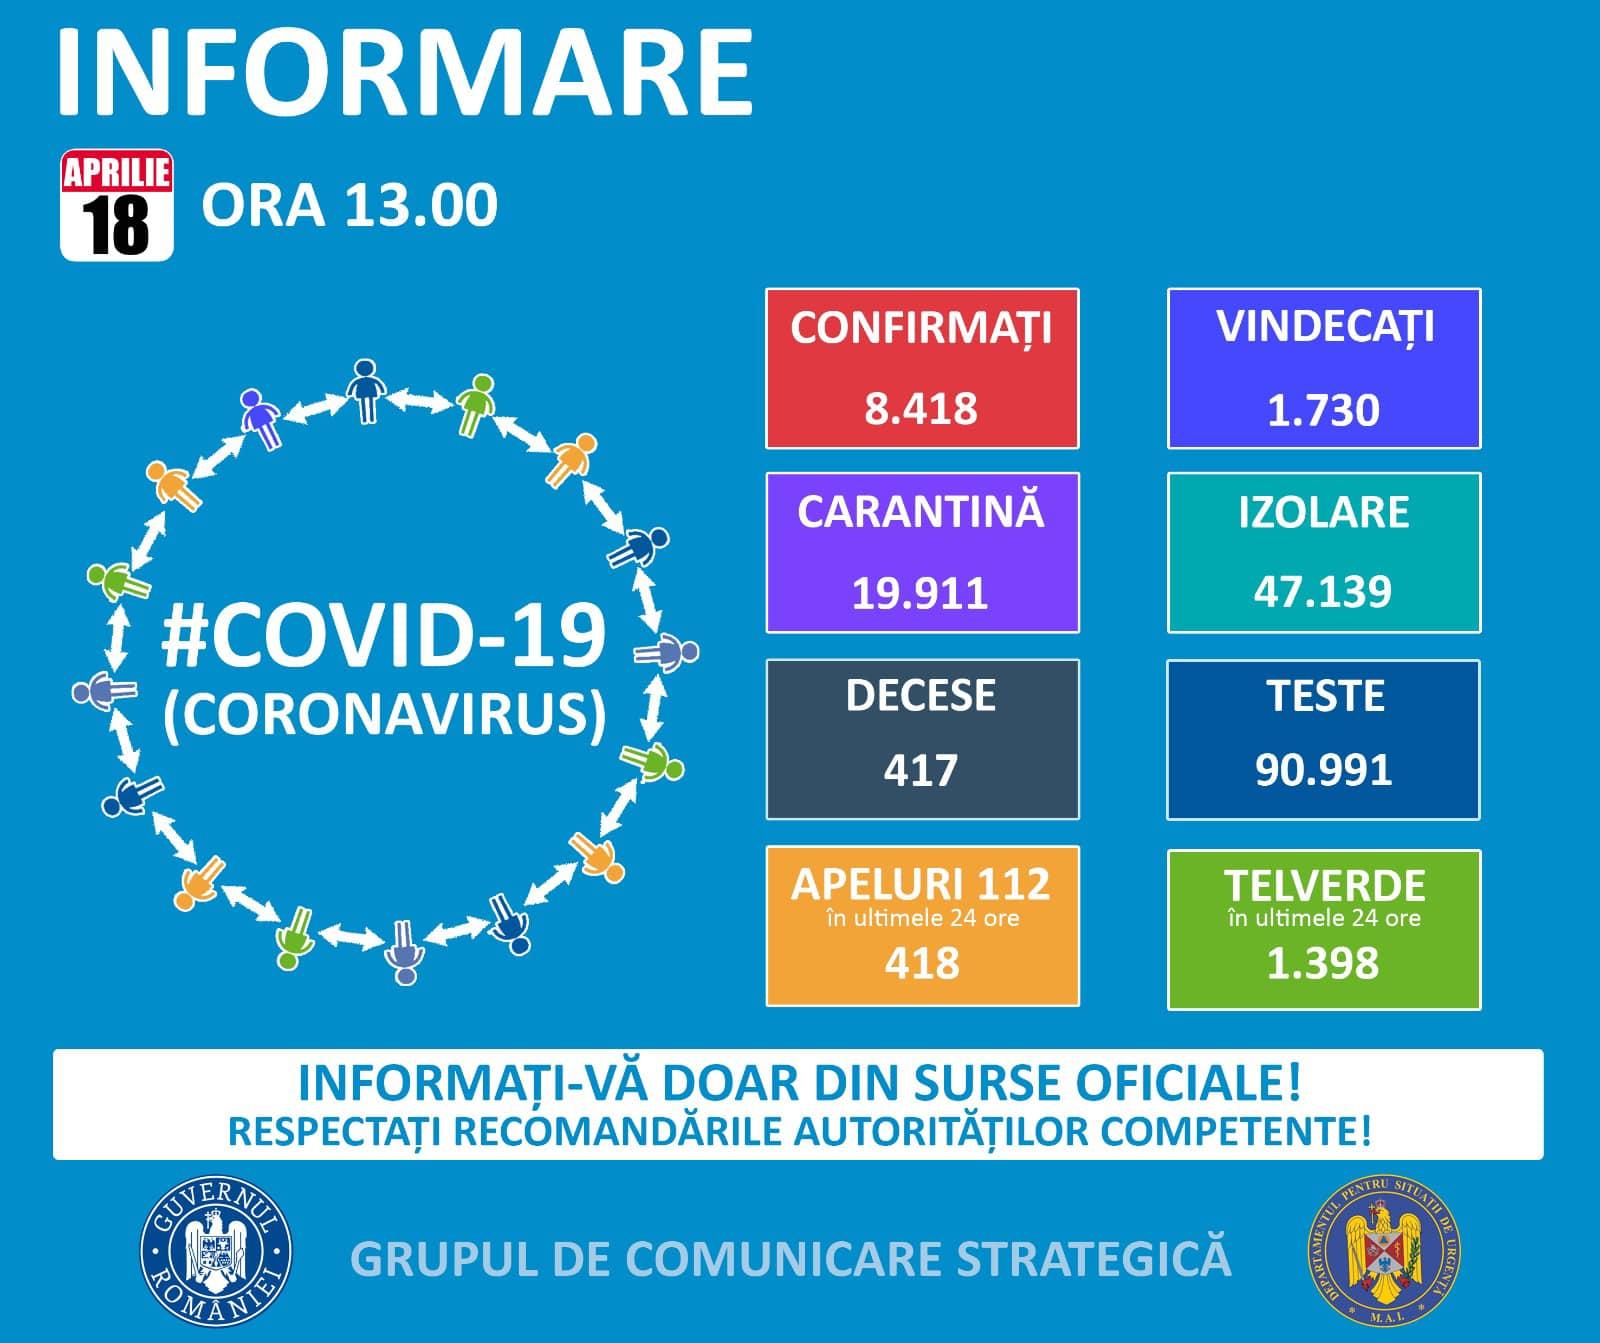 Coronavirus Romania situatie 18 aprilie 2020